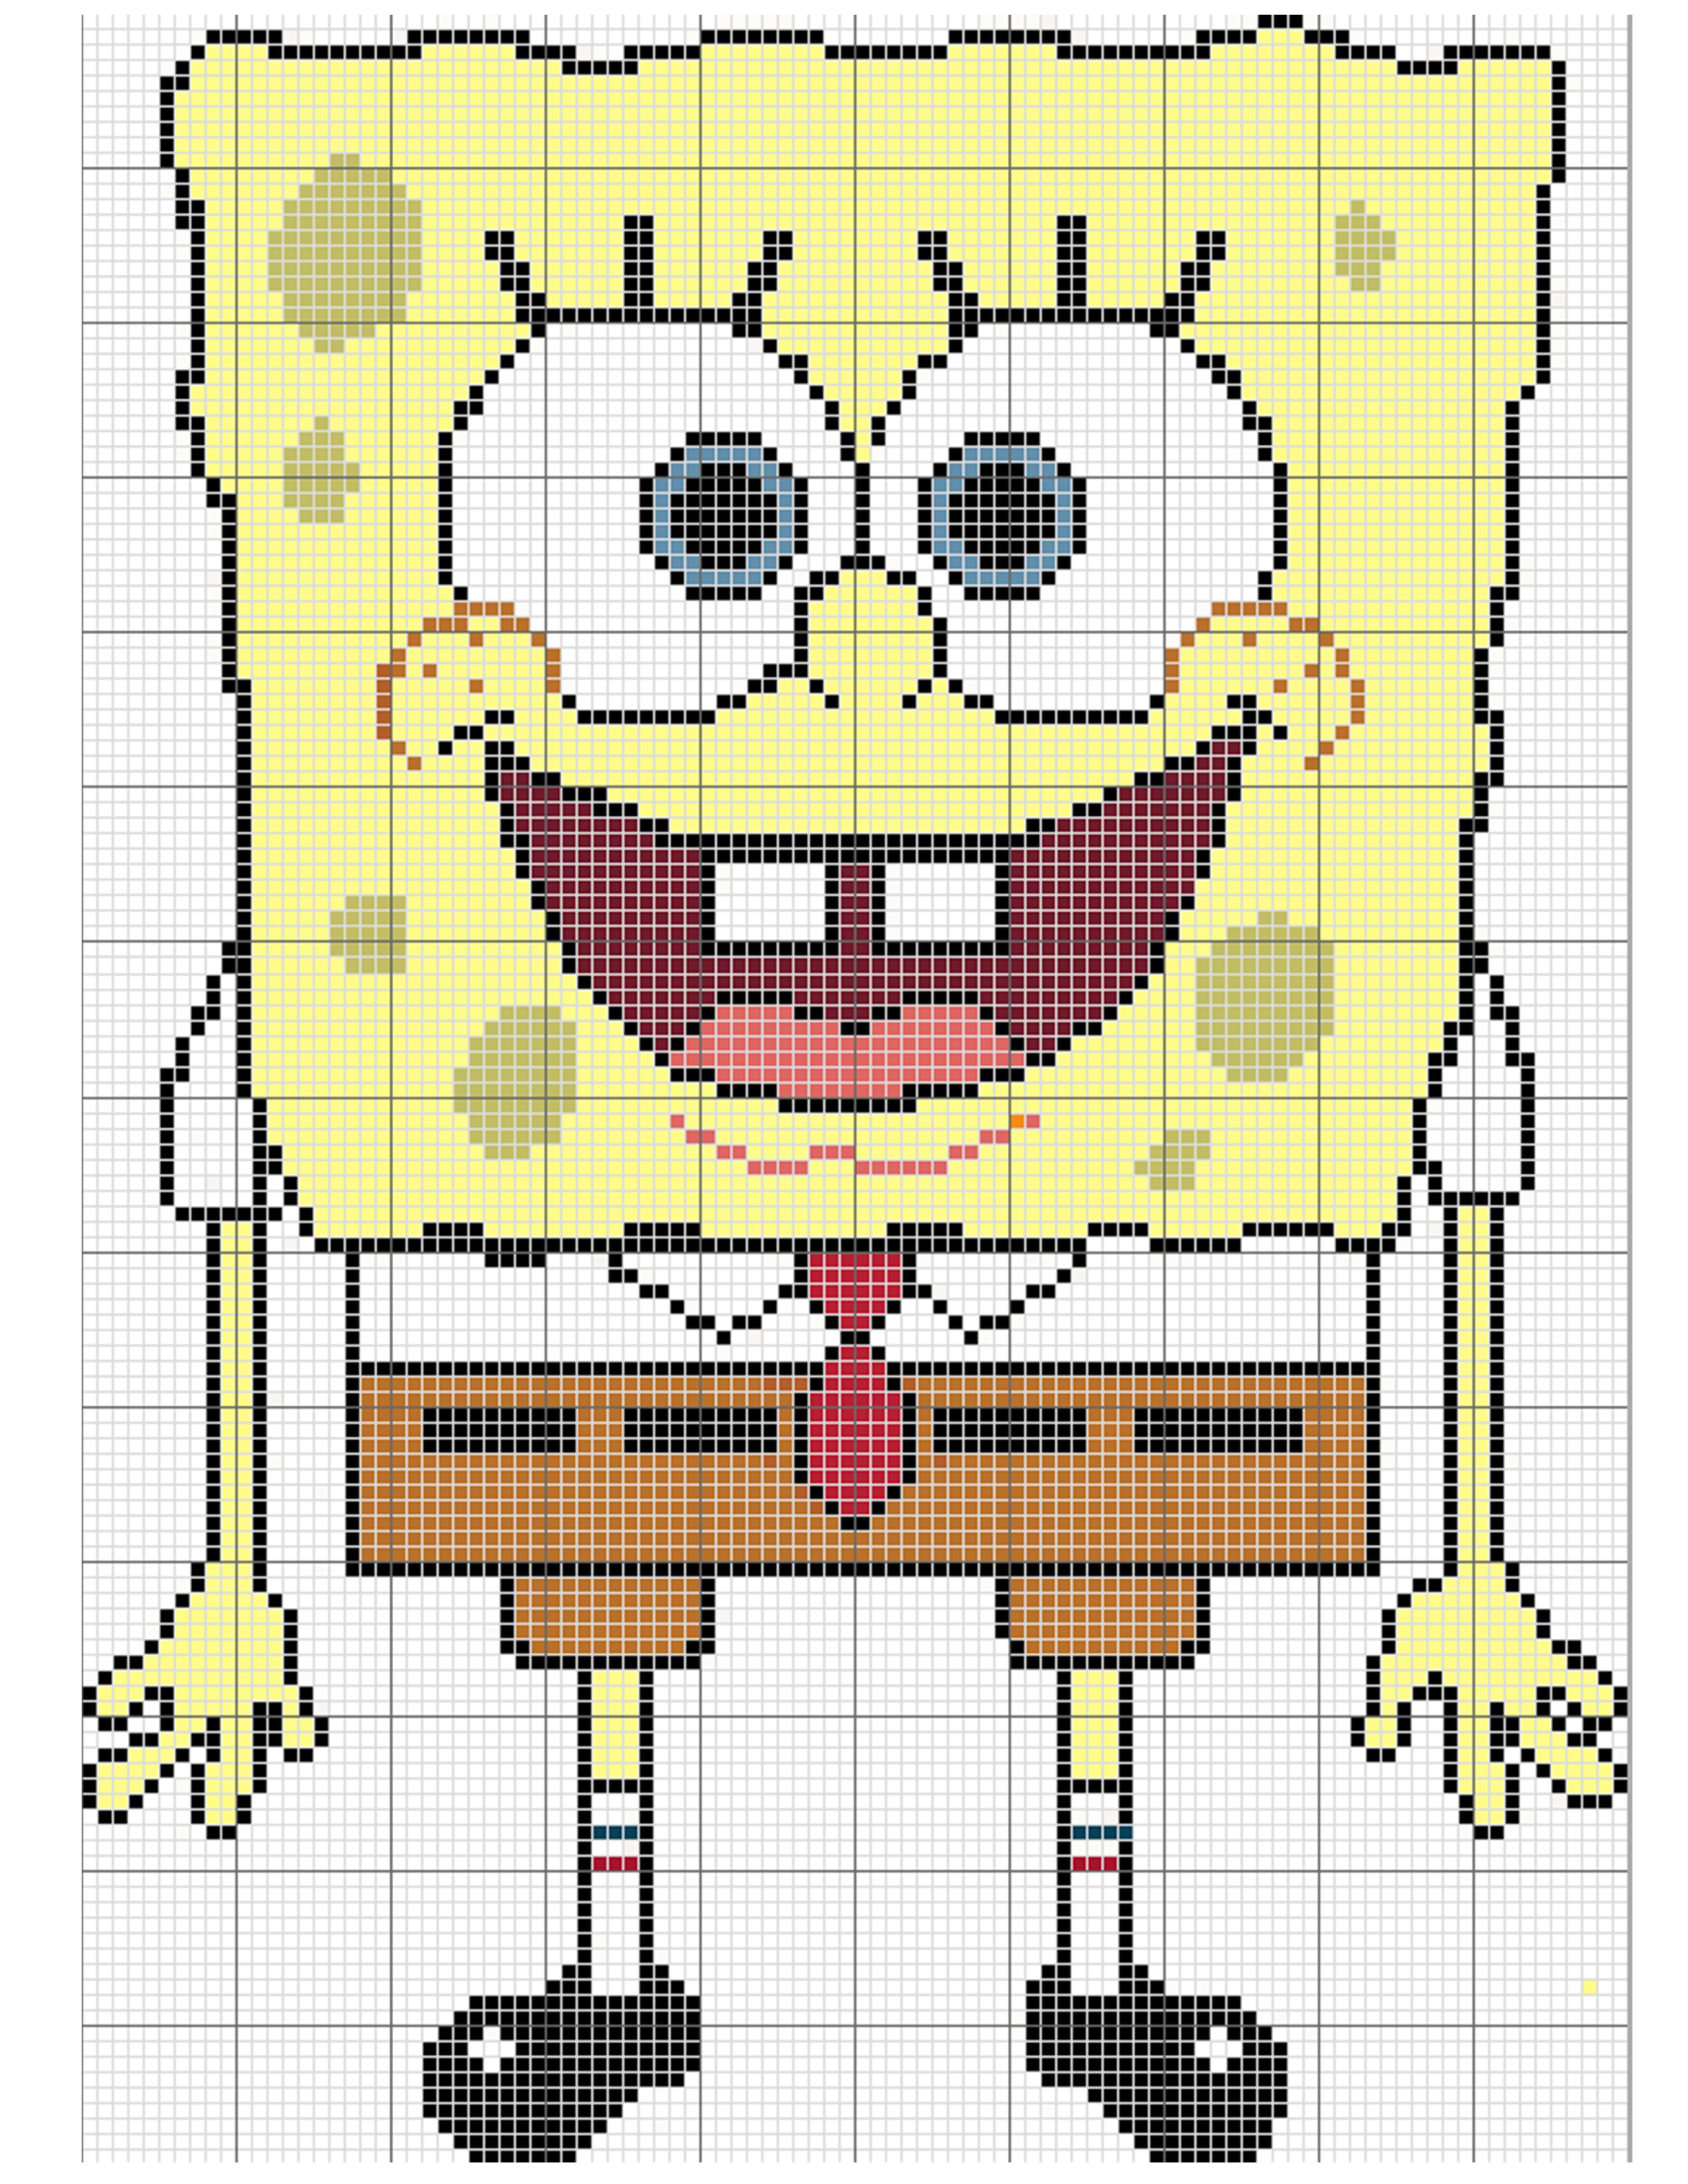 Spongebob crochet afghan free pattern sponge bob crocheted spongebob crochet afghan free pattern bankloansurffo Image collections